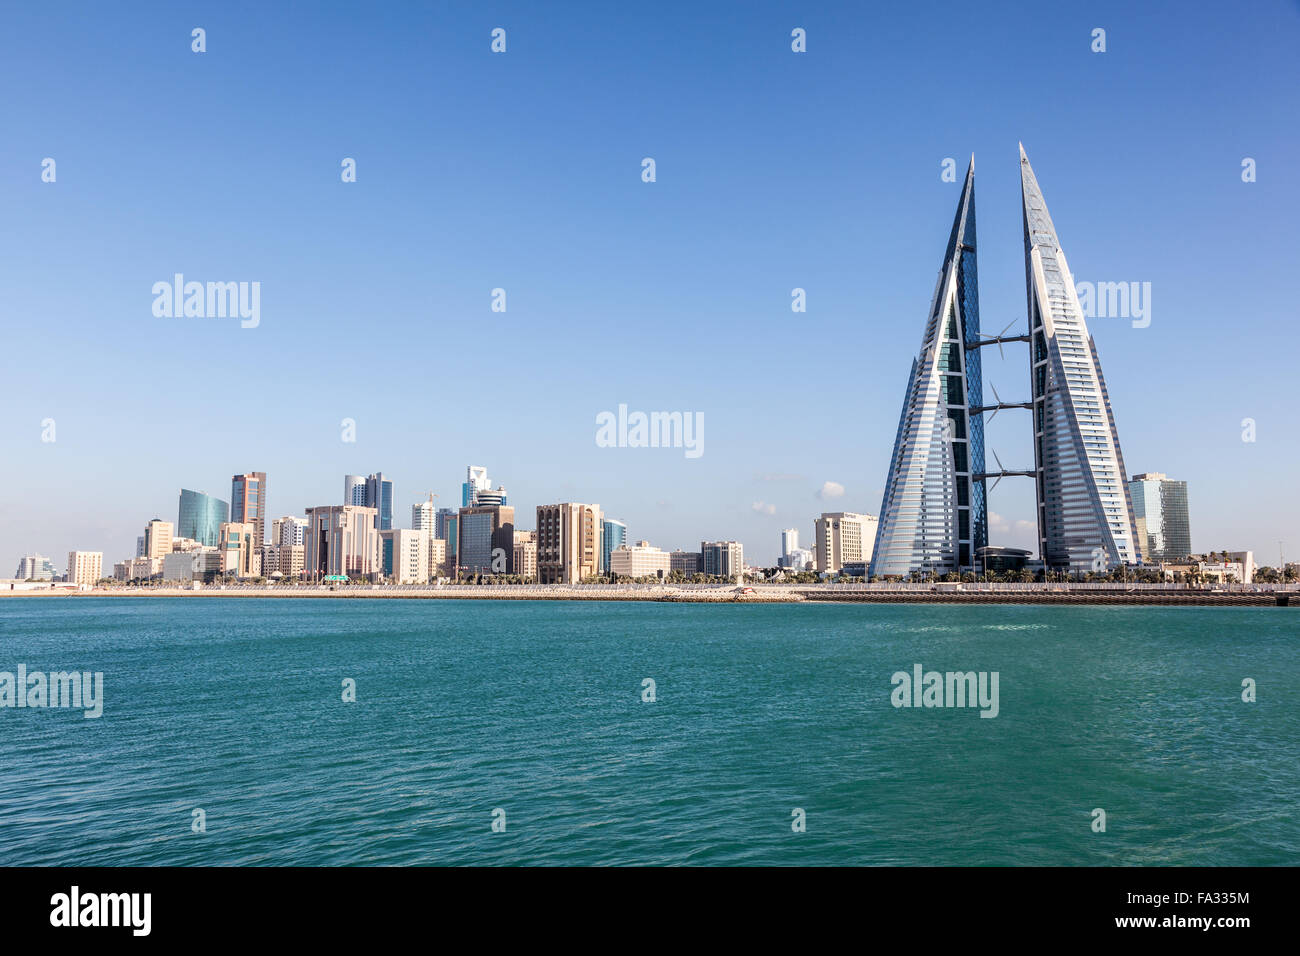 Manama skyline, Kingdom of Bahrain - Stock Image